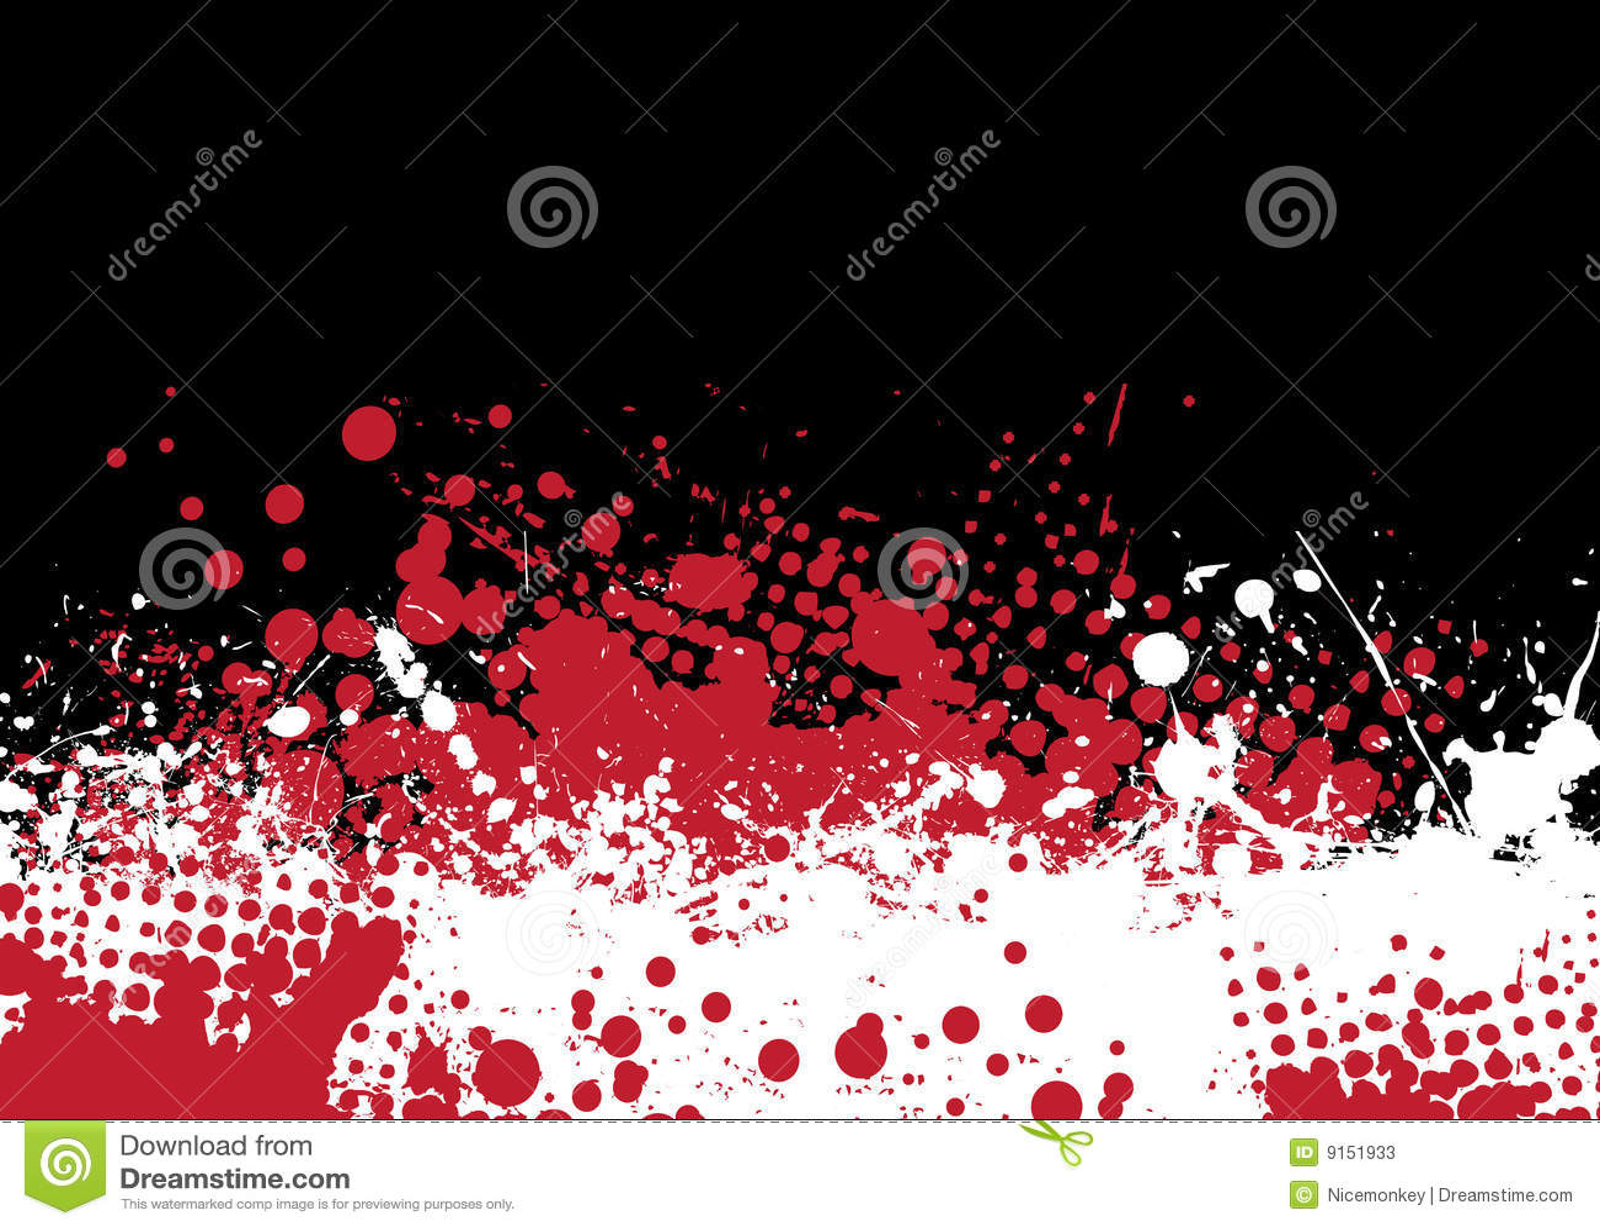 Blood tone